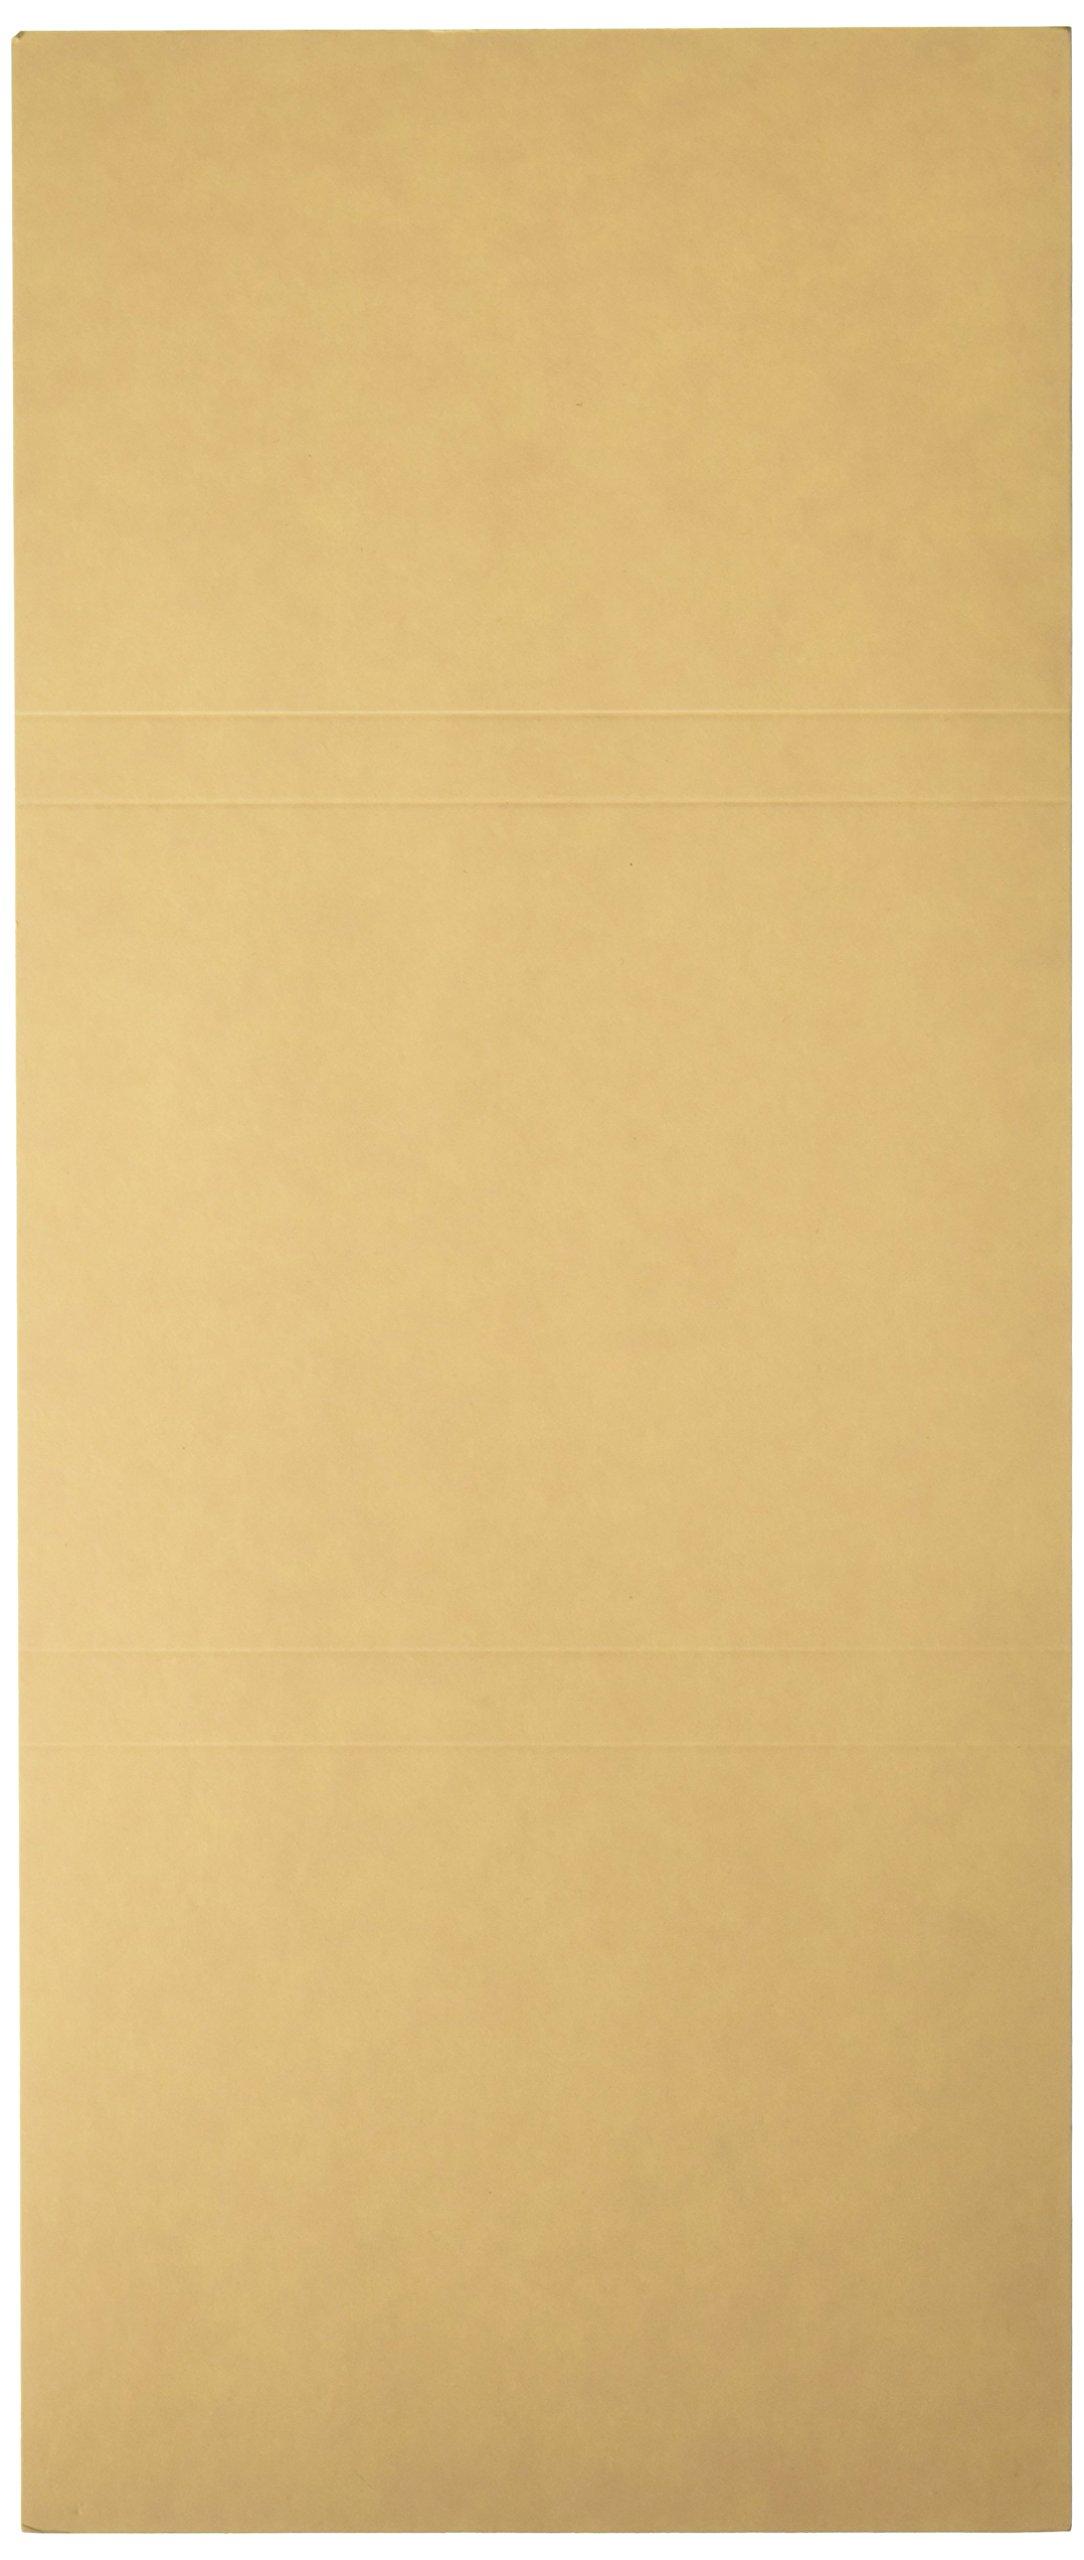 PDC Healthcare F3B File Folder Double Fold for Prescriptions Cardboard, 5-1/2'' x 13'' Buff (Pack of 100)